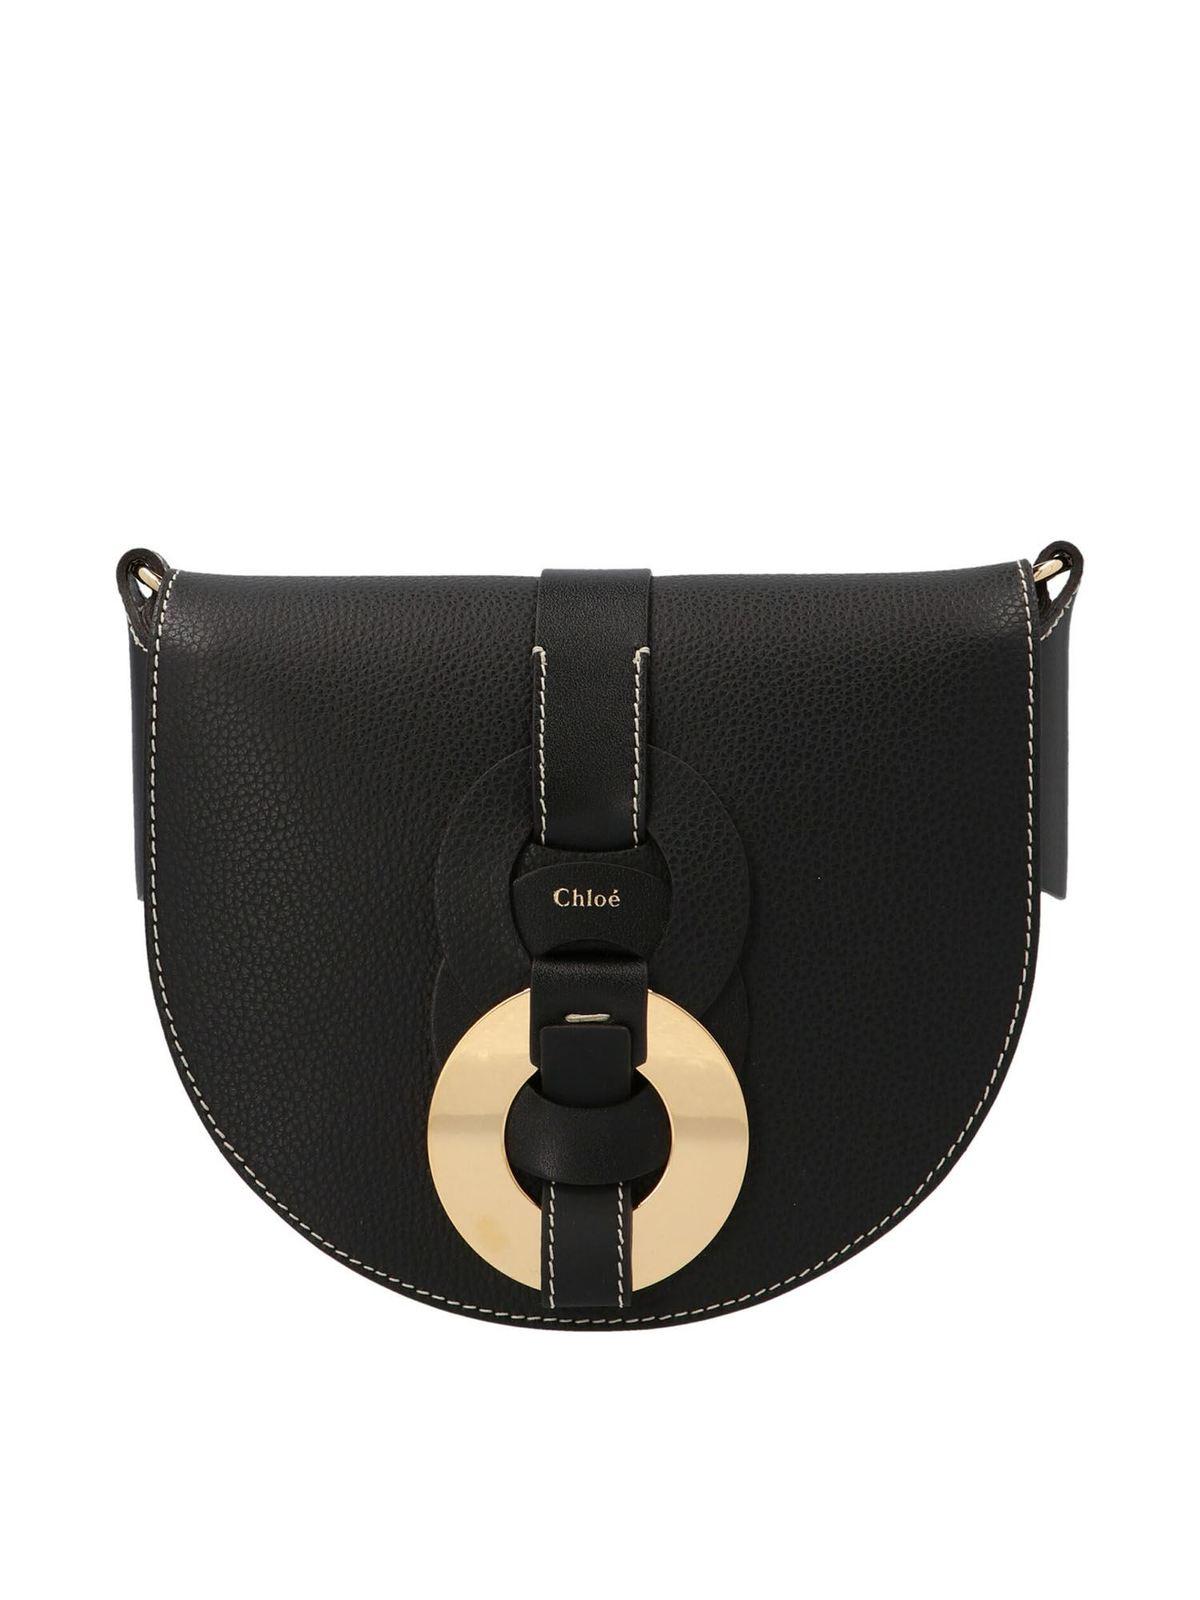 Chloé DARRYL SMALL BAG IN BLACK